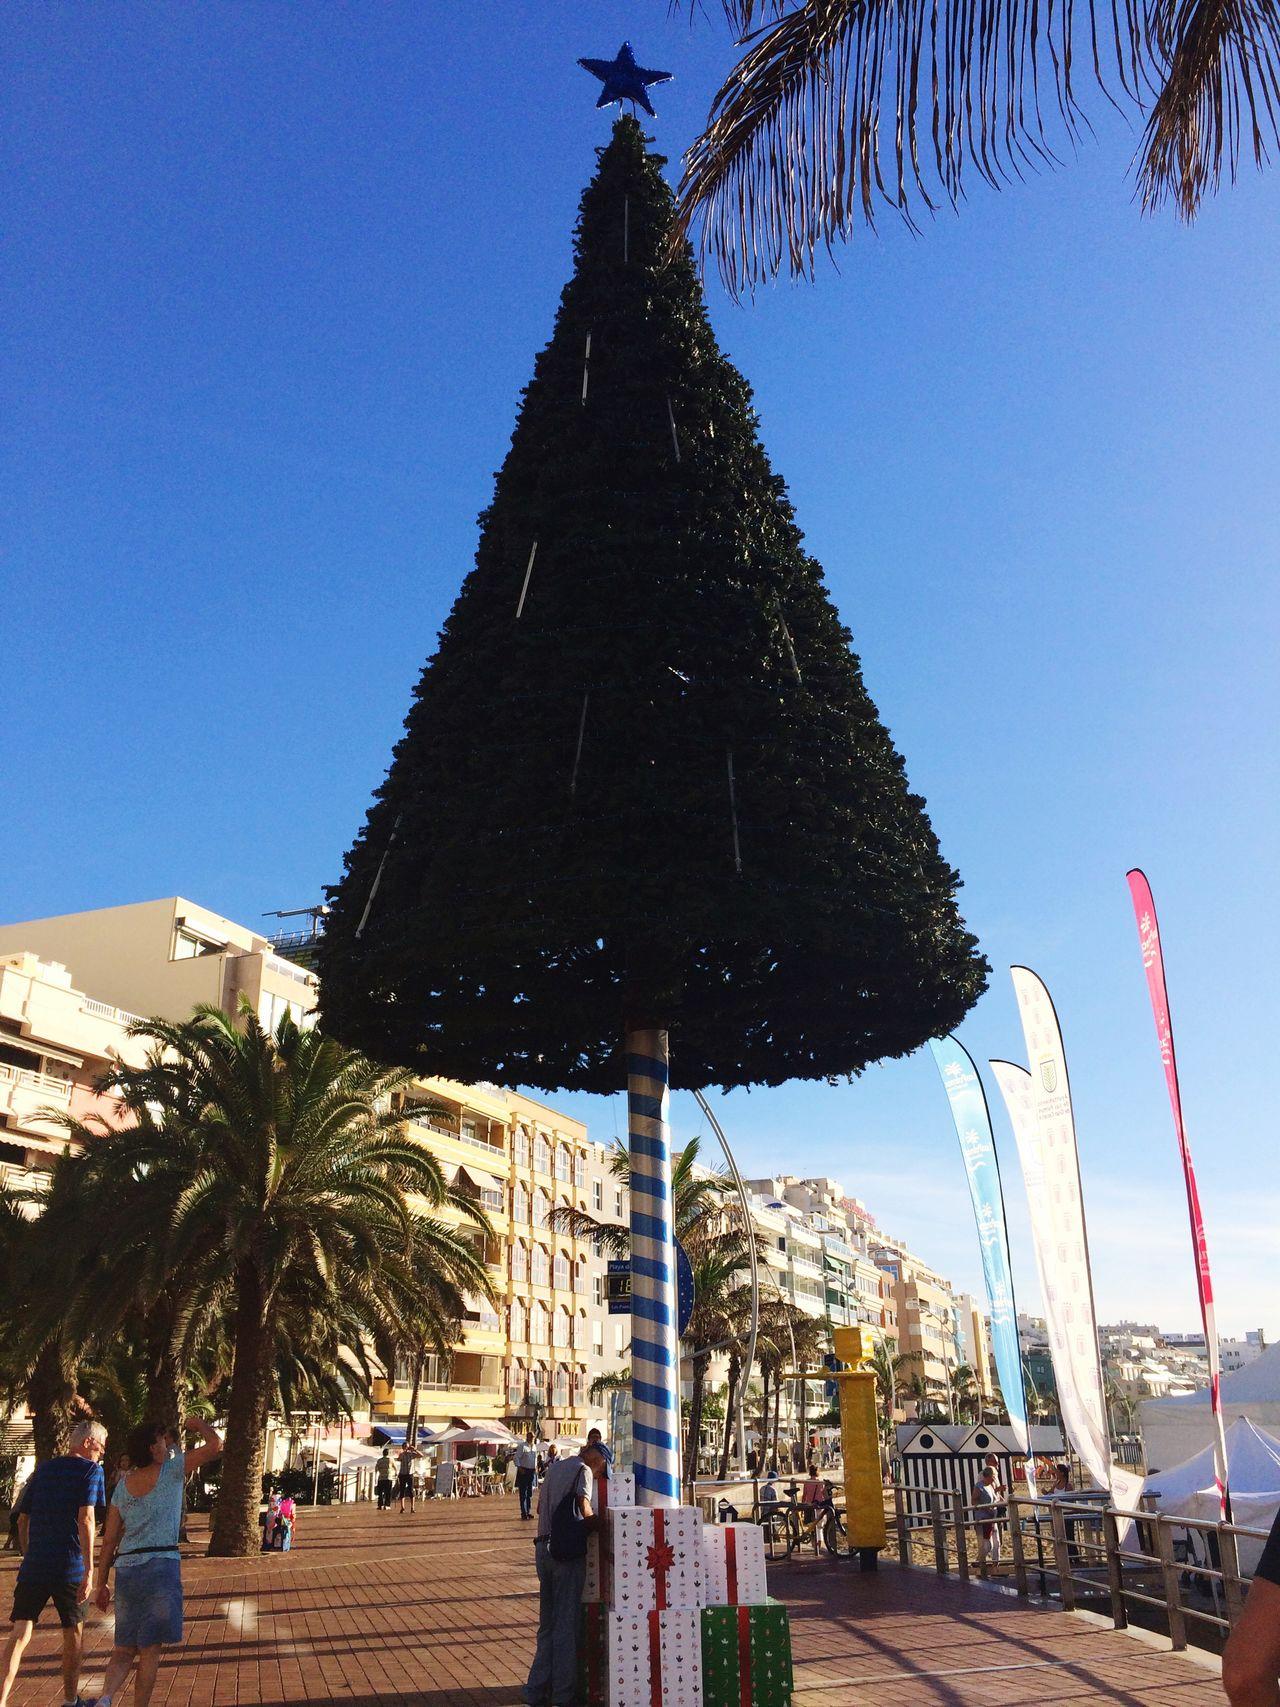 December Christmas Tree Gran Canaria Sunshine Lovely Weather Las Palmas De Gran Canaria Clear Sky